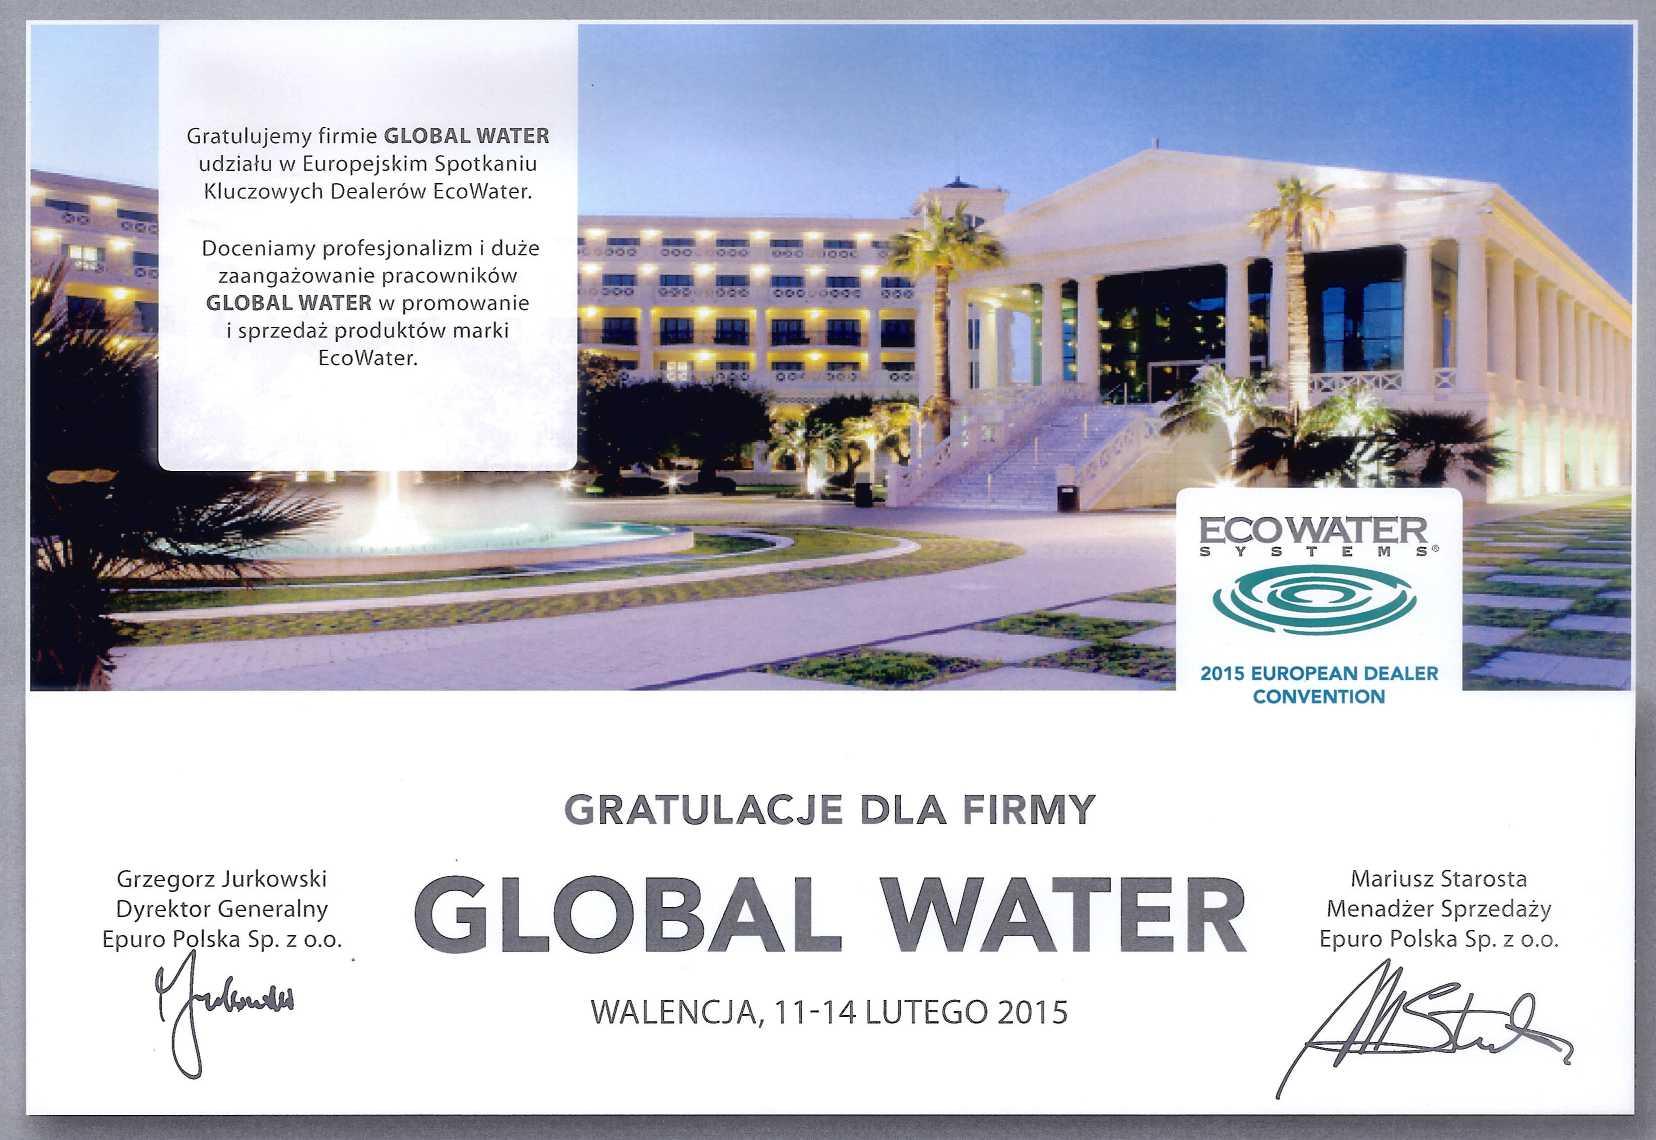 Global Water - dystrybutor na Polskę marki Ecowater